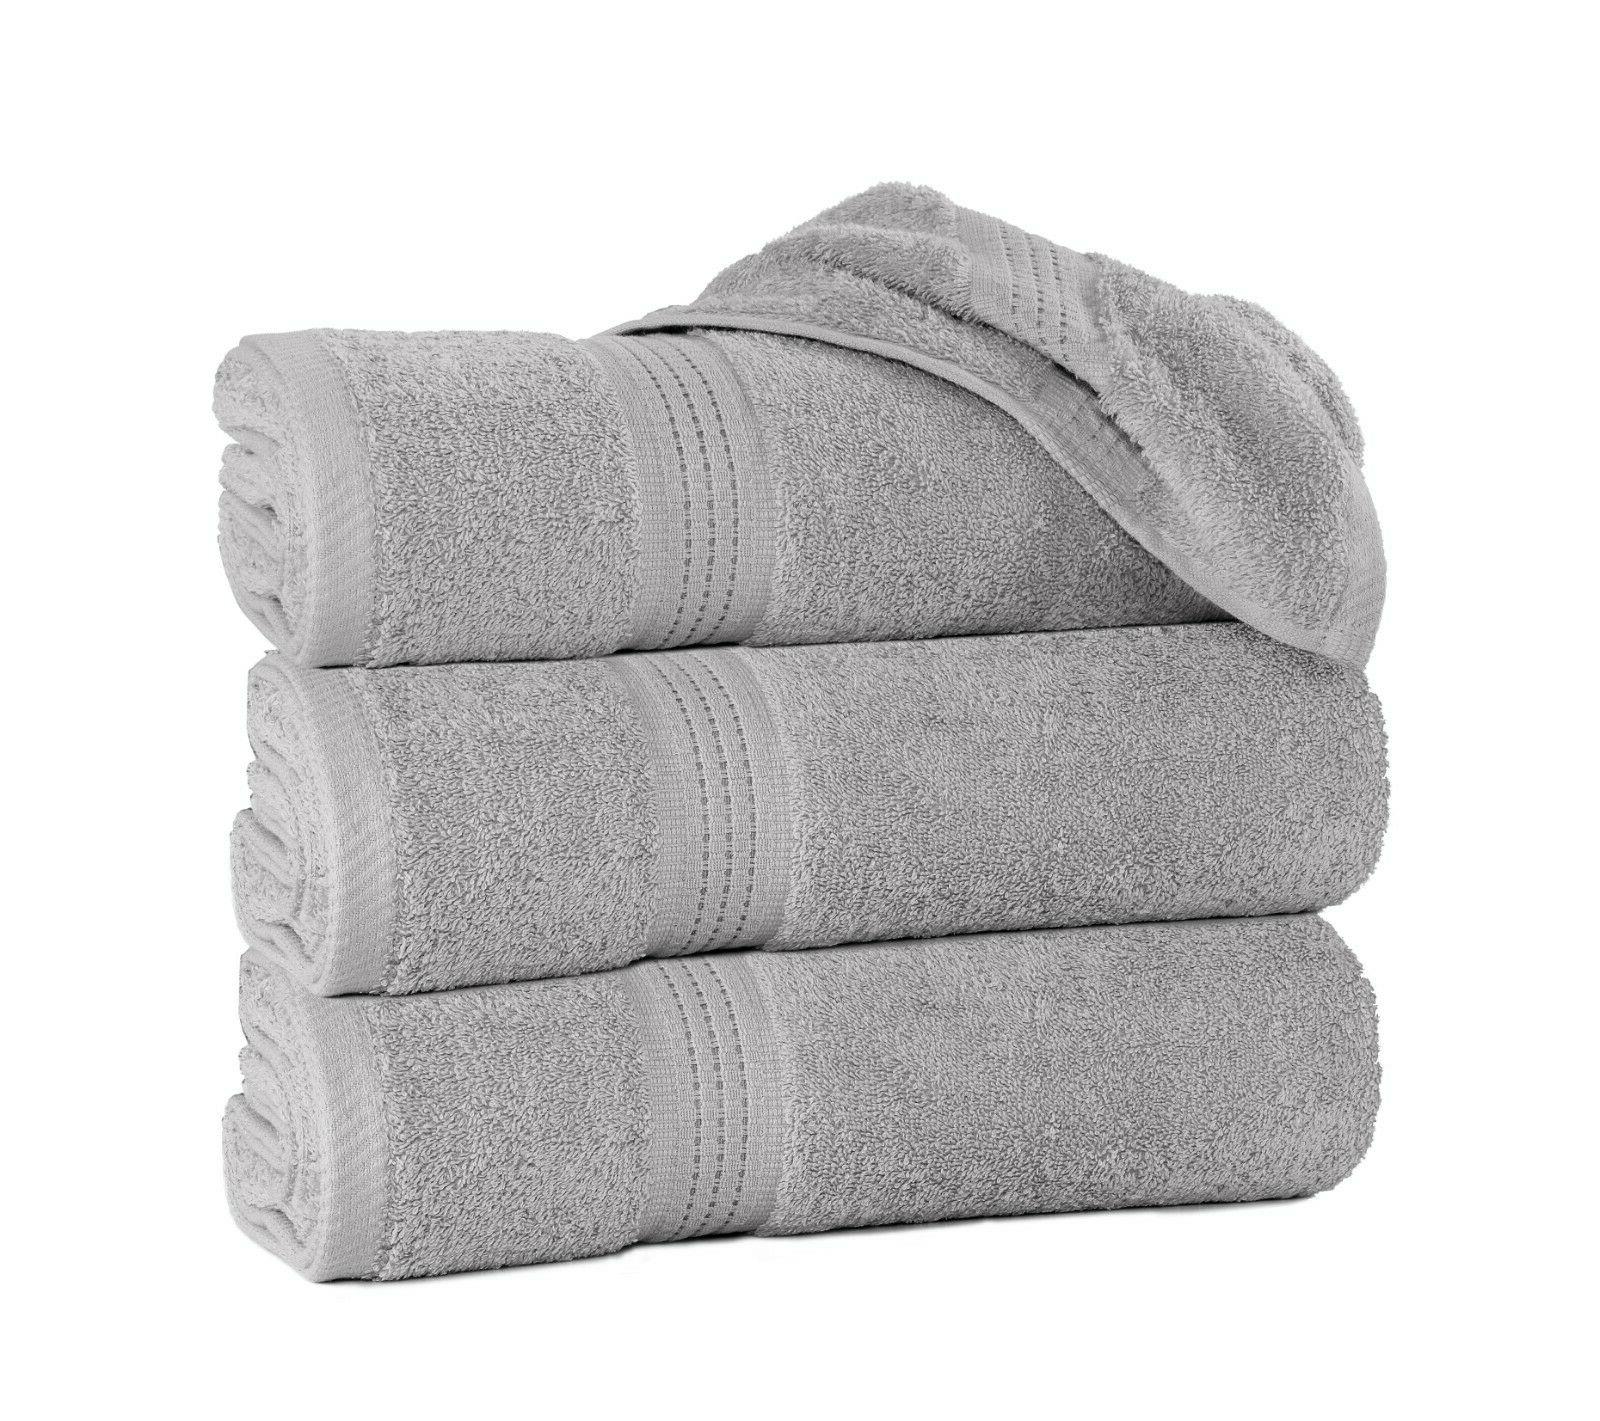 "Luxury Gray Bath Towels Cotton 27""x55"" Soft Grey"